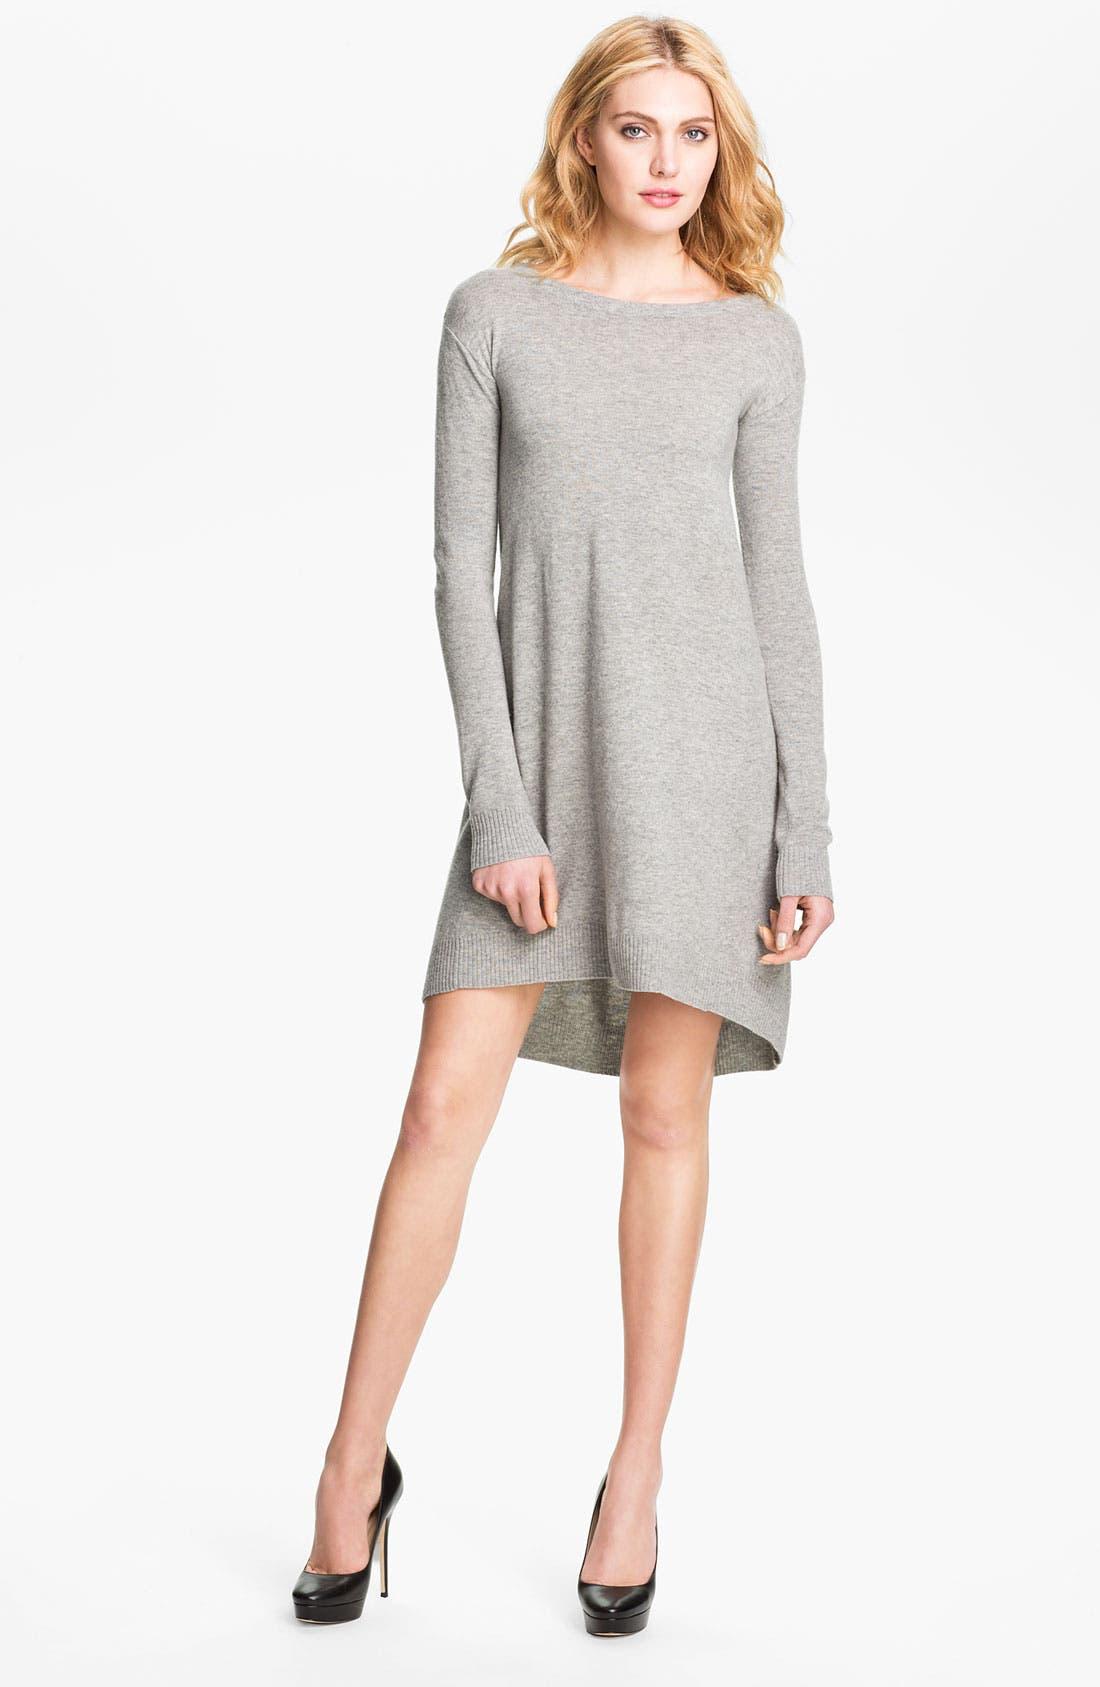 Alternate Image 1 Selected - Diane von Furstenberg 'Branitta' Sweater Dress